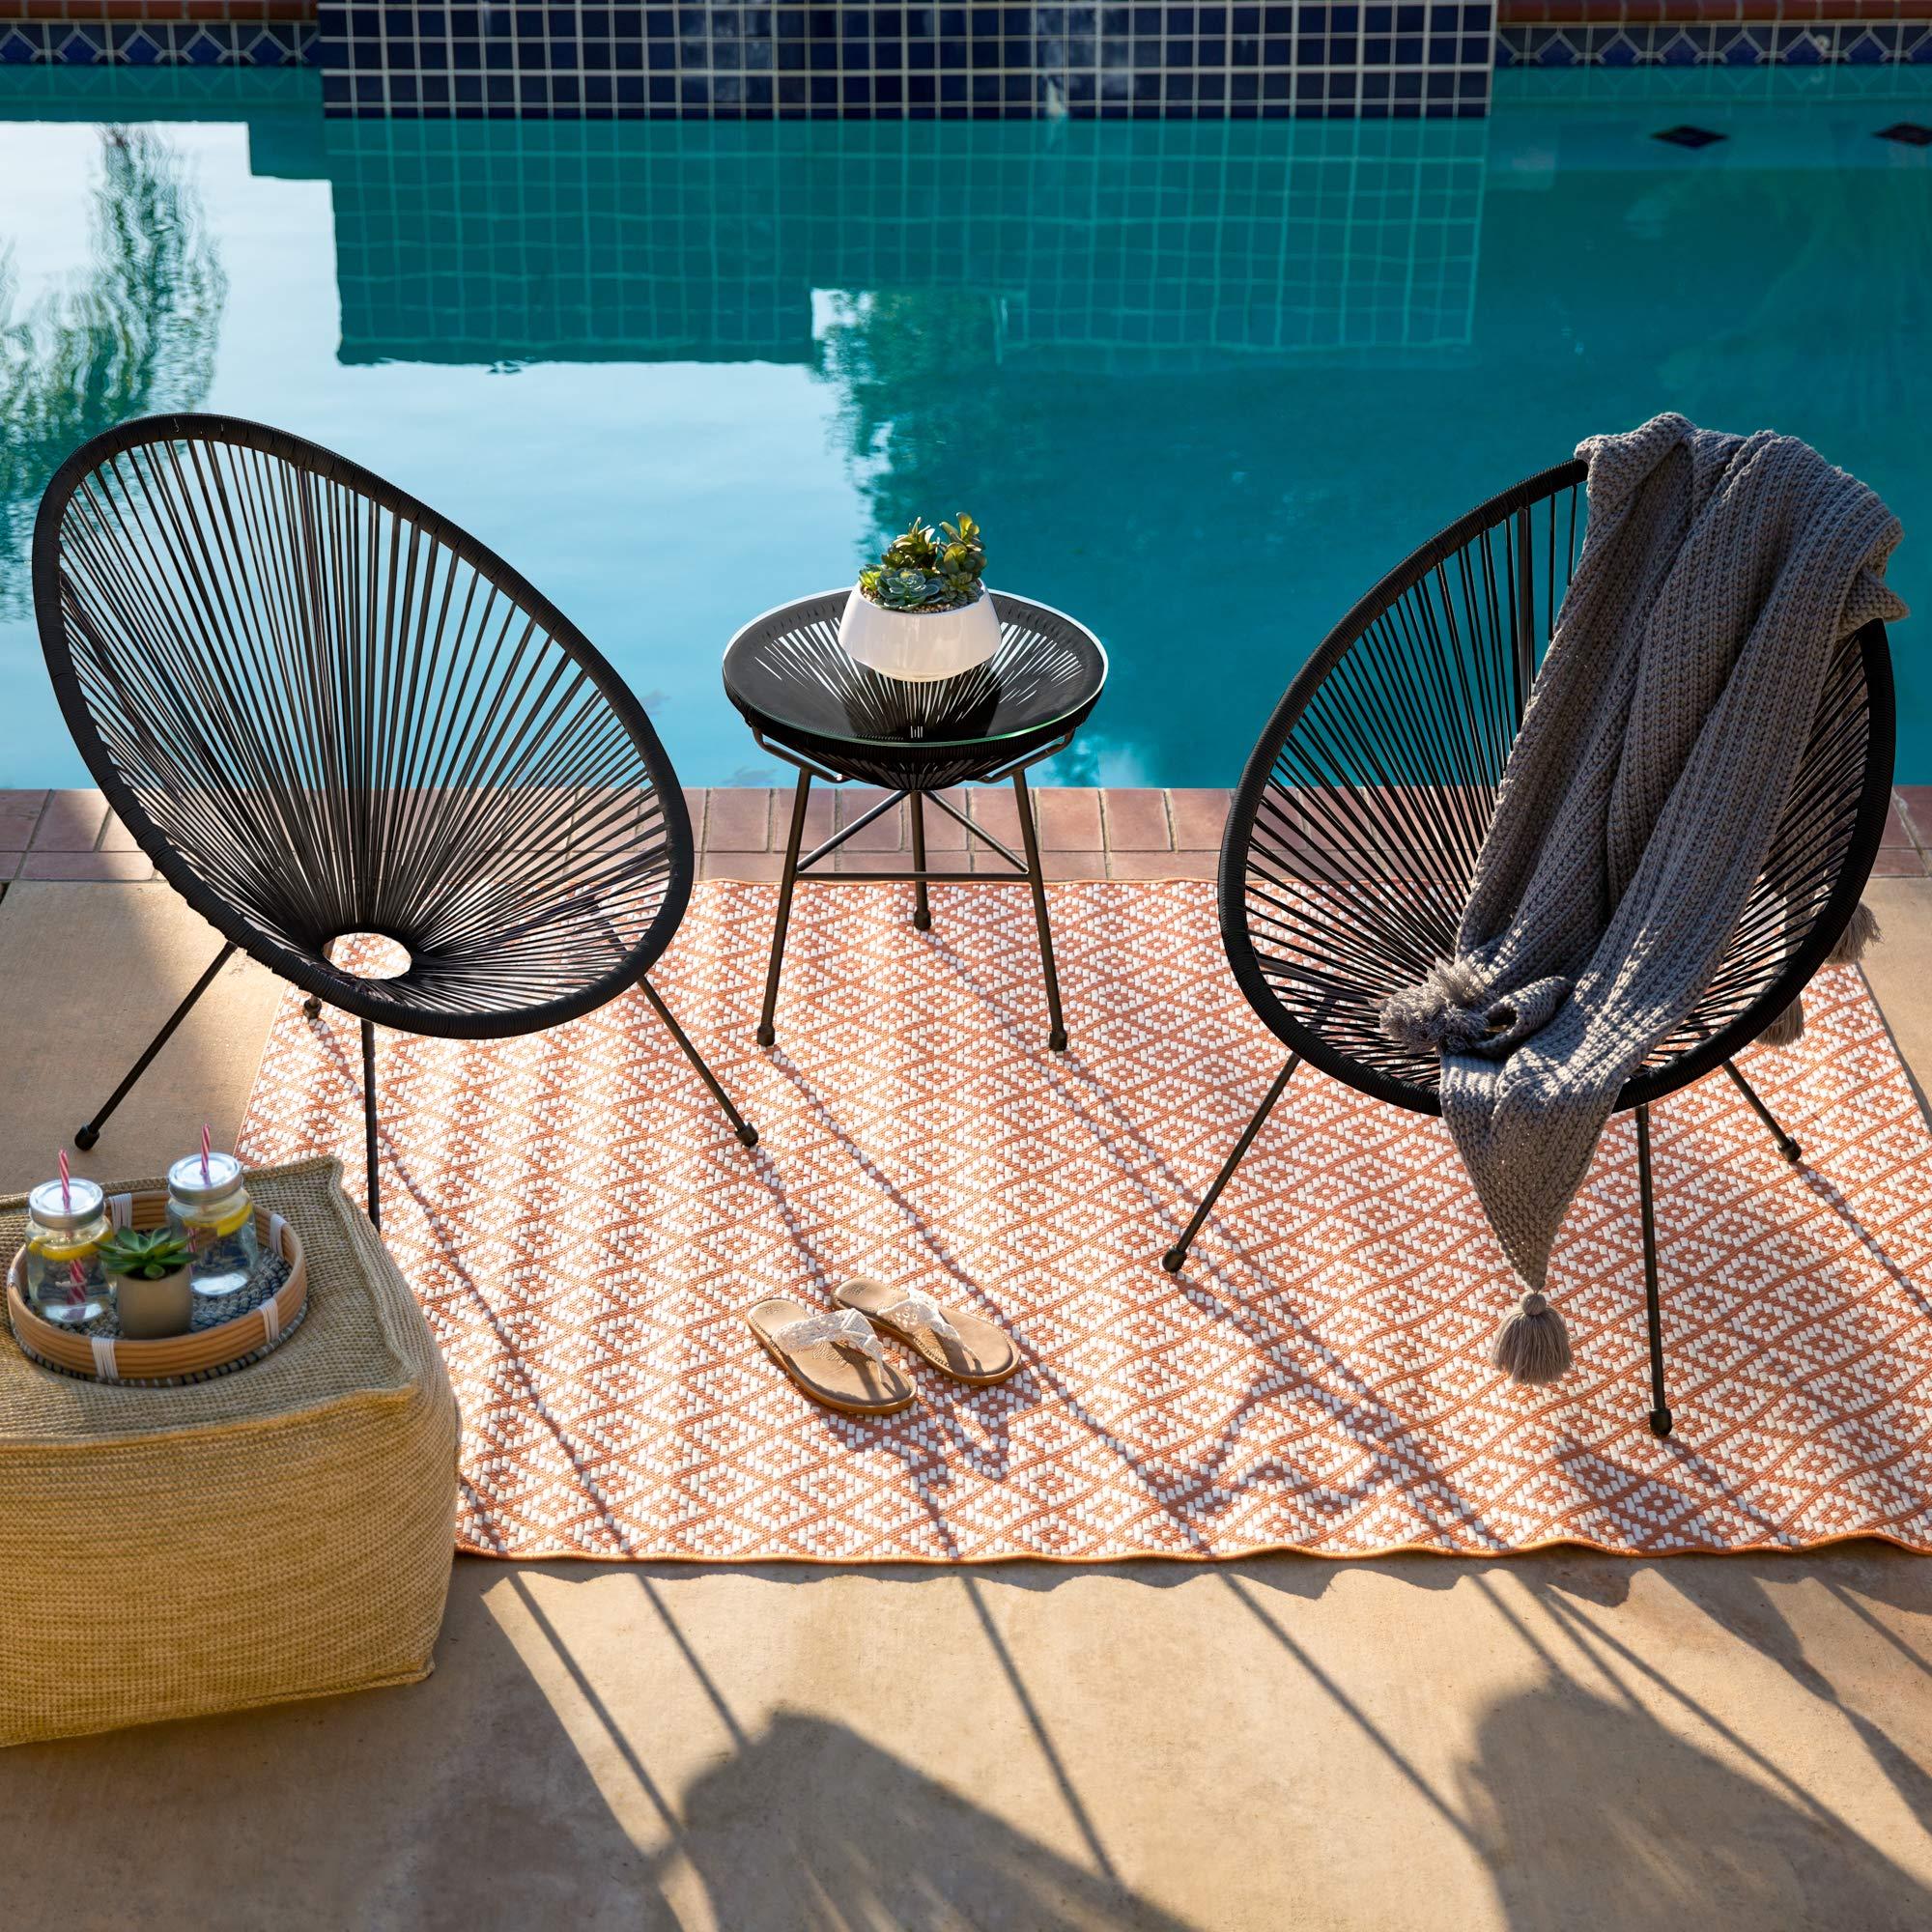 3-Piece All-Weather Patio Acapulco Bistro Furniture Set